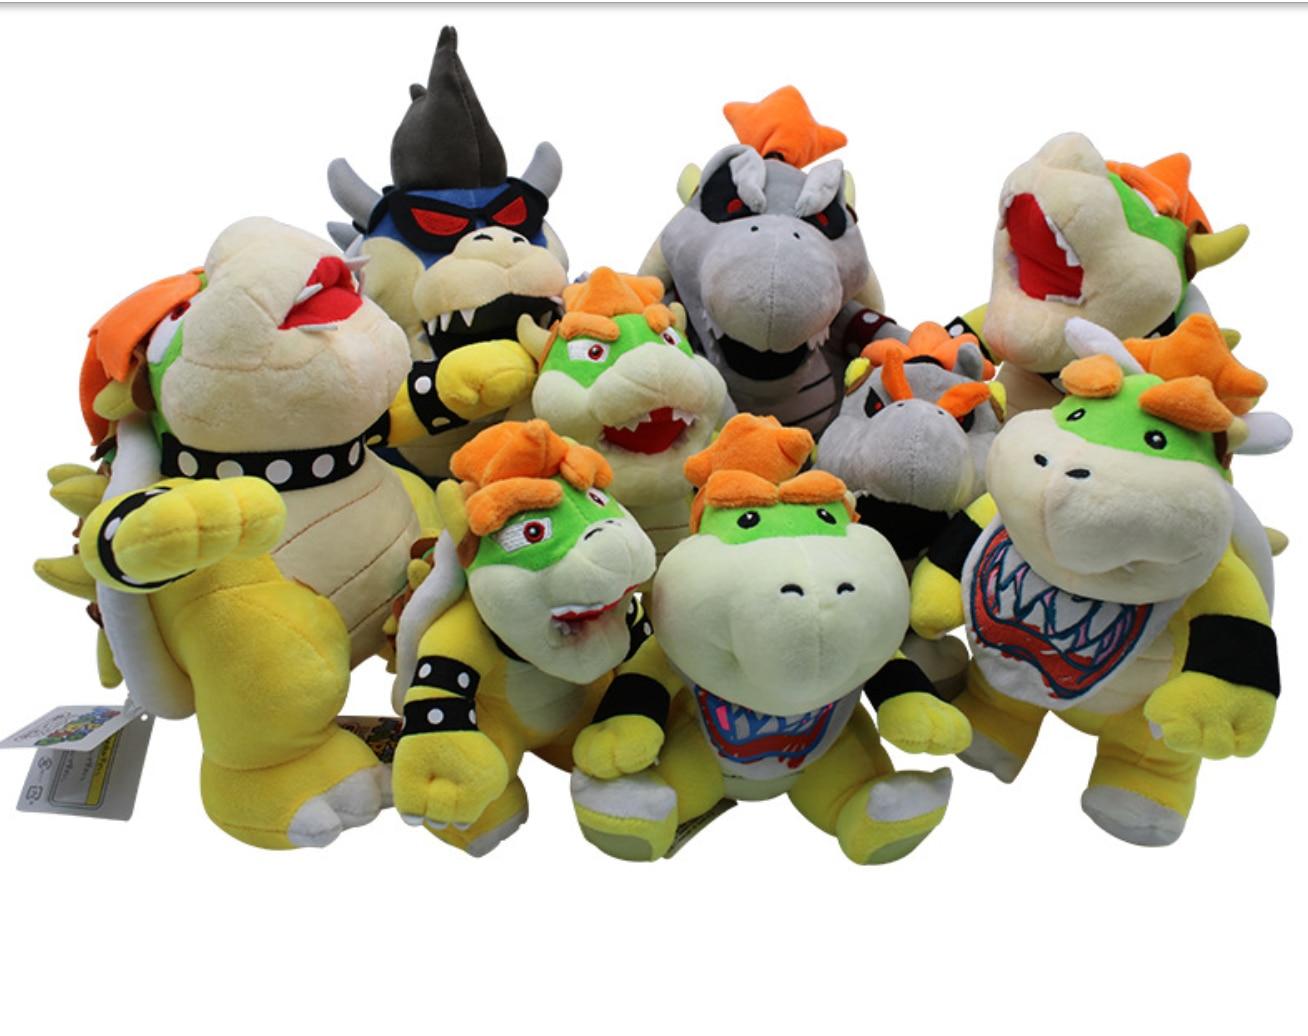 "7-12 ""18-31CM Koopa peluches de felpa Super Mario 3D tierra hueso Kubah Bowser dragón de peluche de juguete almohada de peluche huesos secos envío gratis"